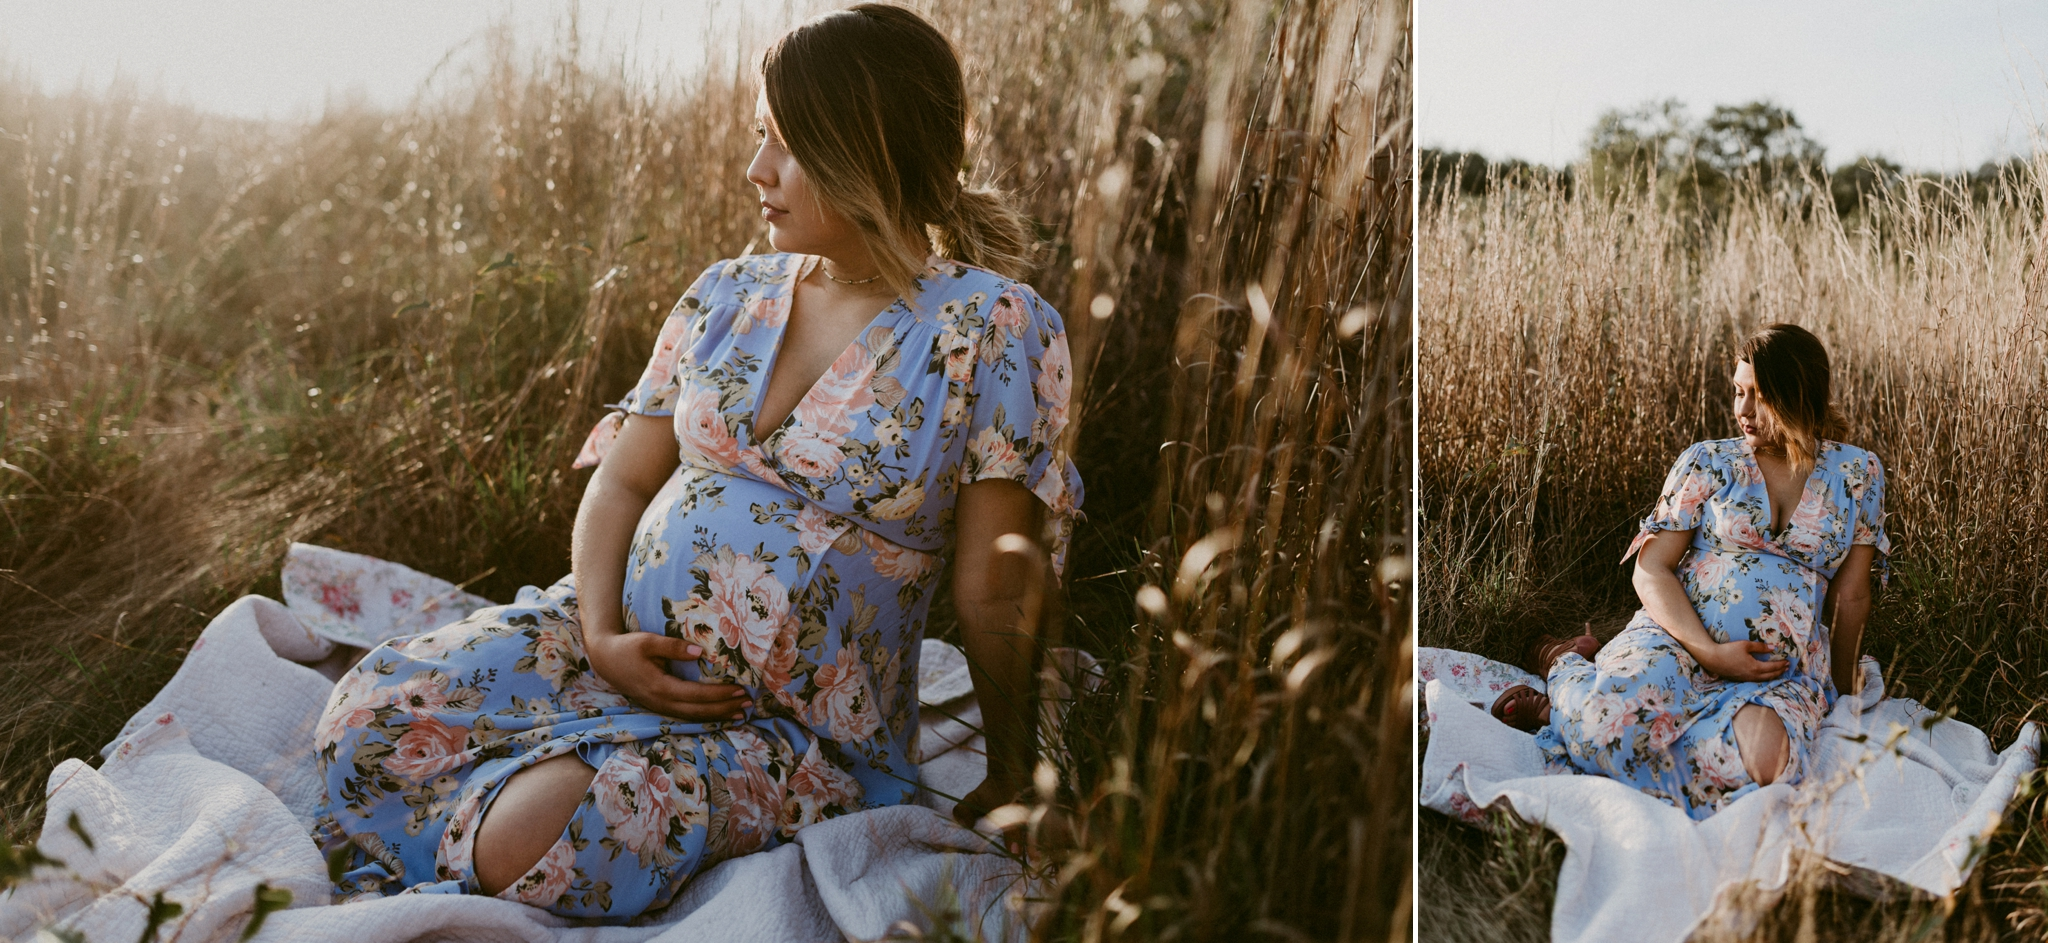 rustic-intimate-tall-grass-motherhood-maternity-session-kerlyn-van-gelder-photography-corpus-christi-photographer